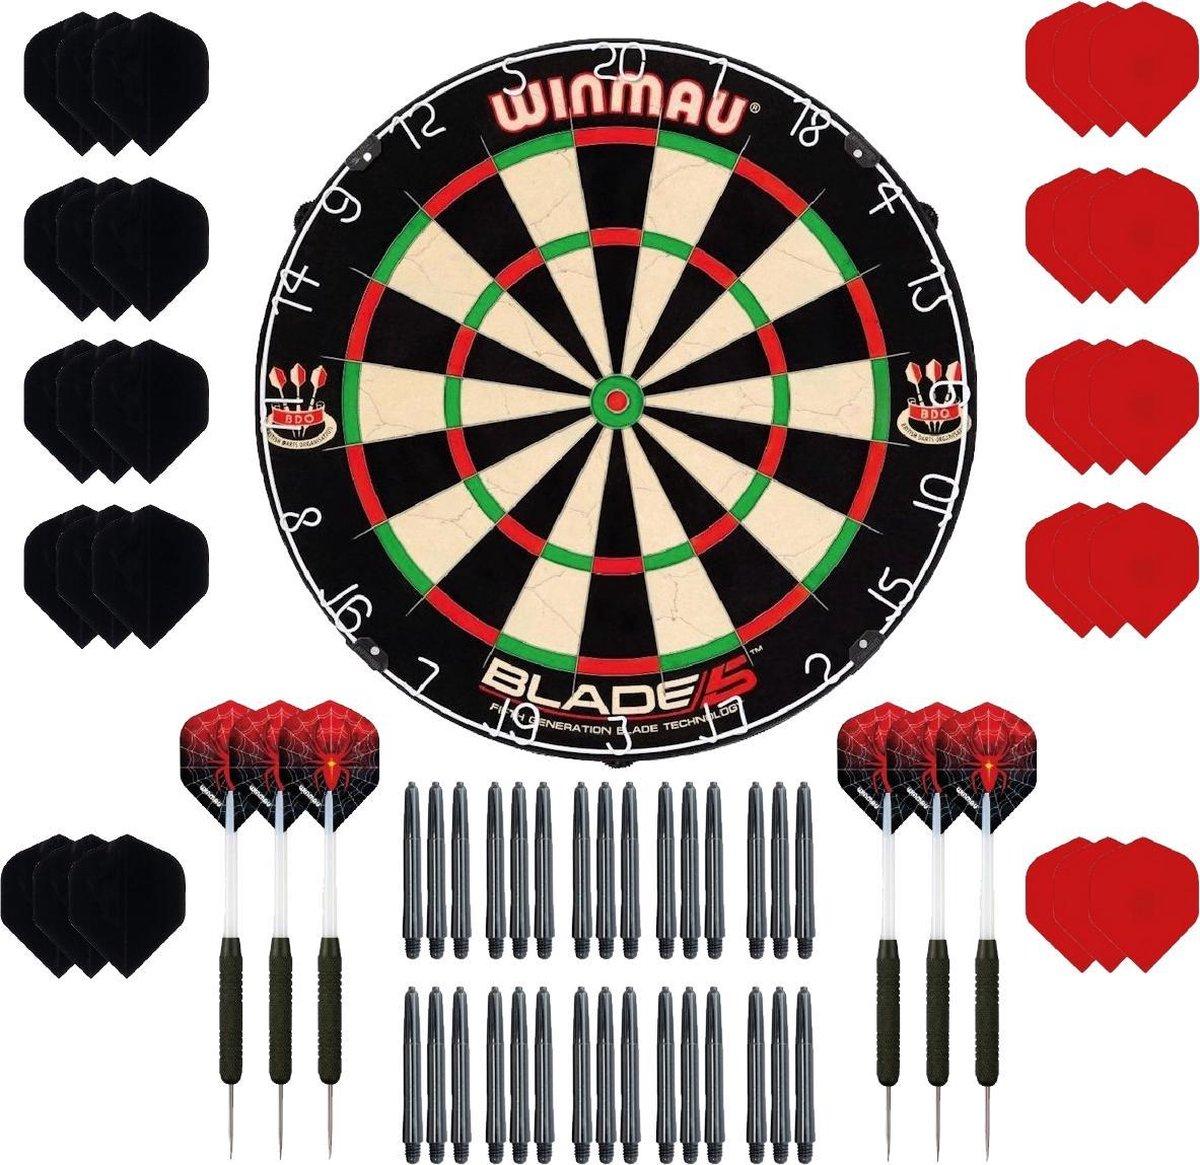 Winmau set - Winmau Blade 5 - dartbord - plus 2 sets - dartpijlen - plus 30 - dartflights - plus 30 - dartshafts